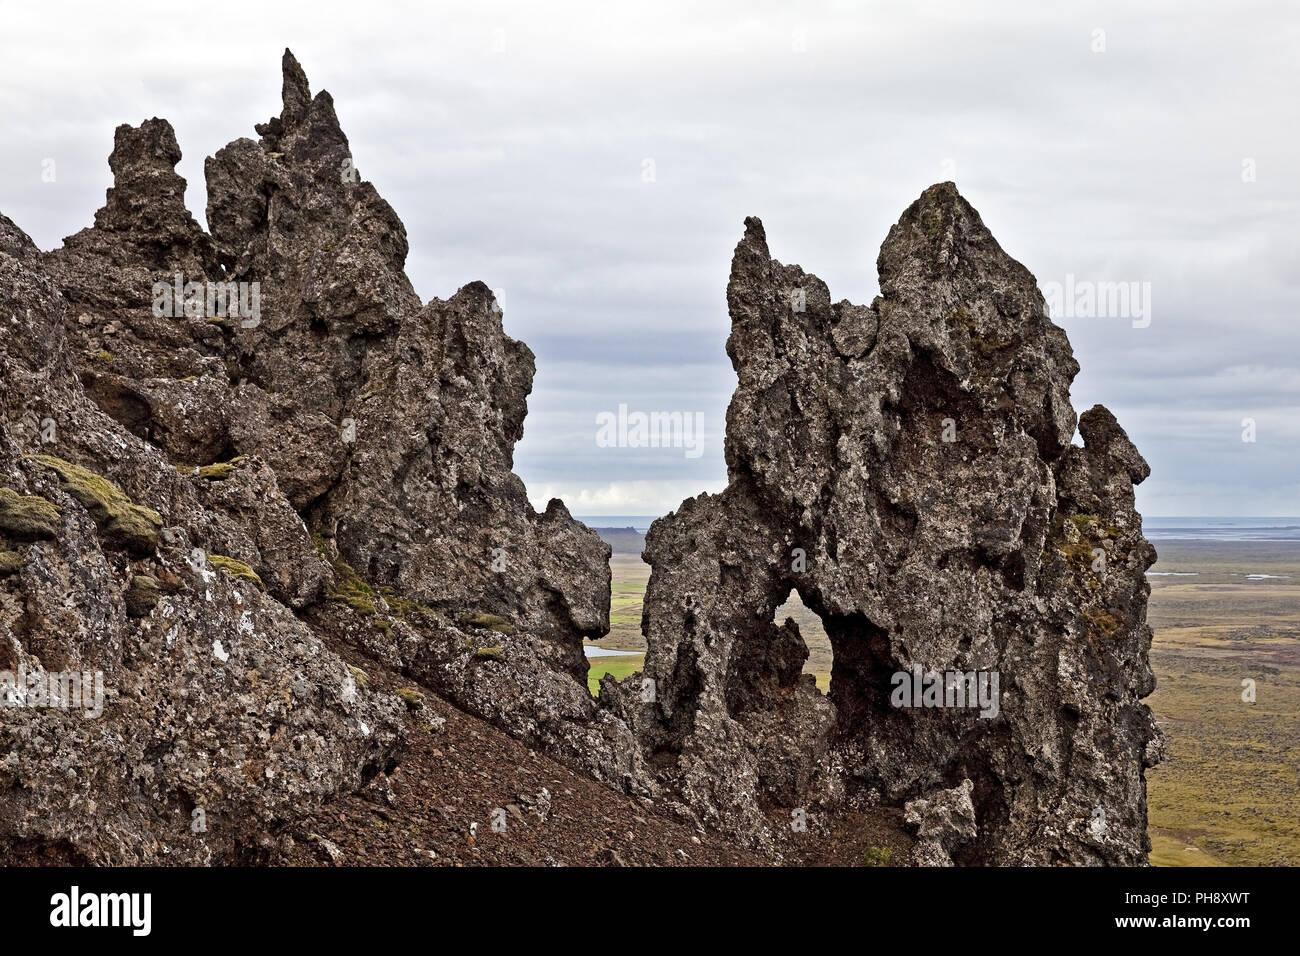 lava rocks of Kolbeinsstadarfjall, Snaefellsnes, Iceland - Stock Image